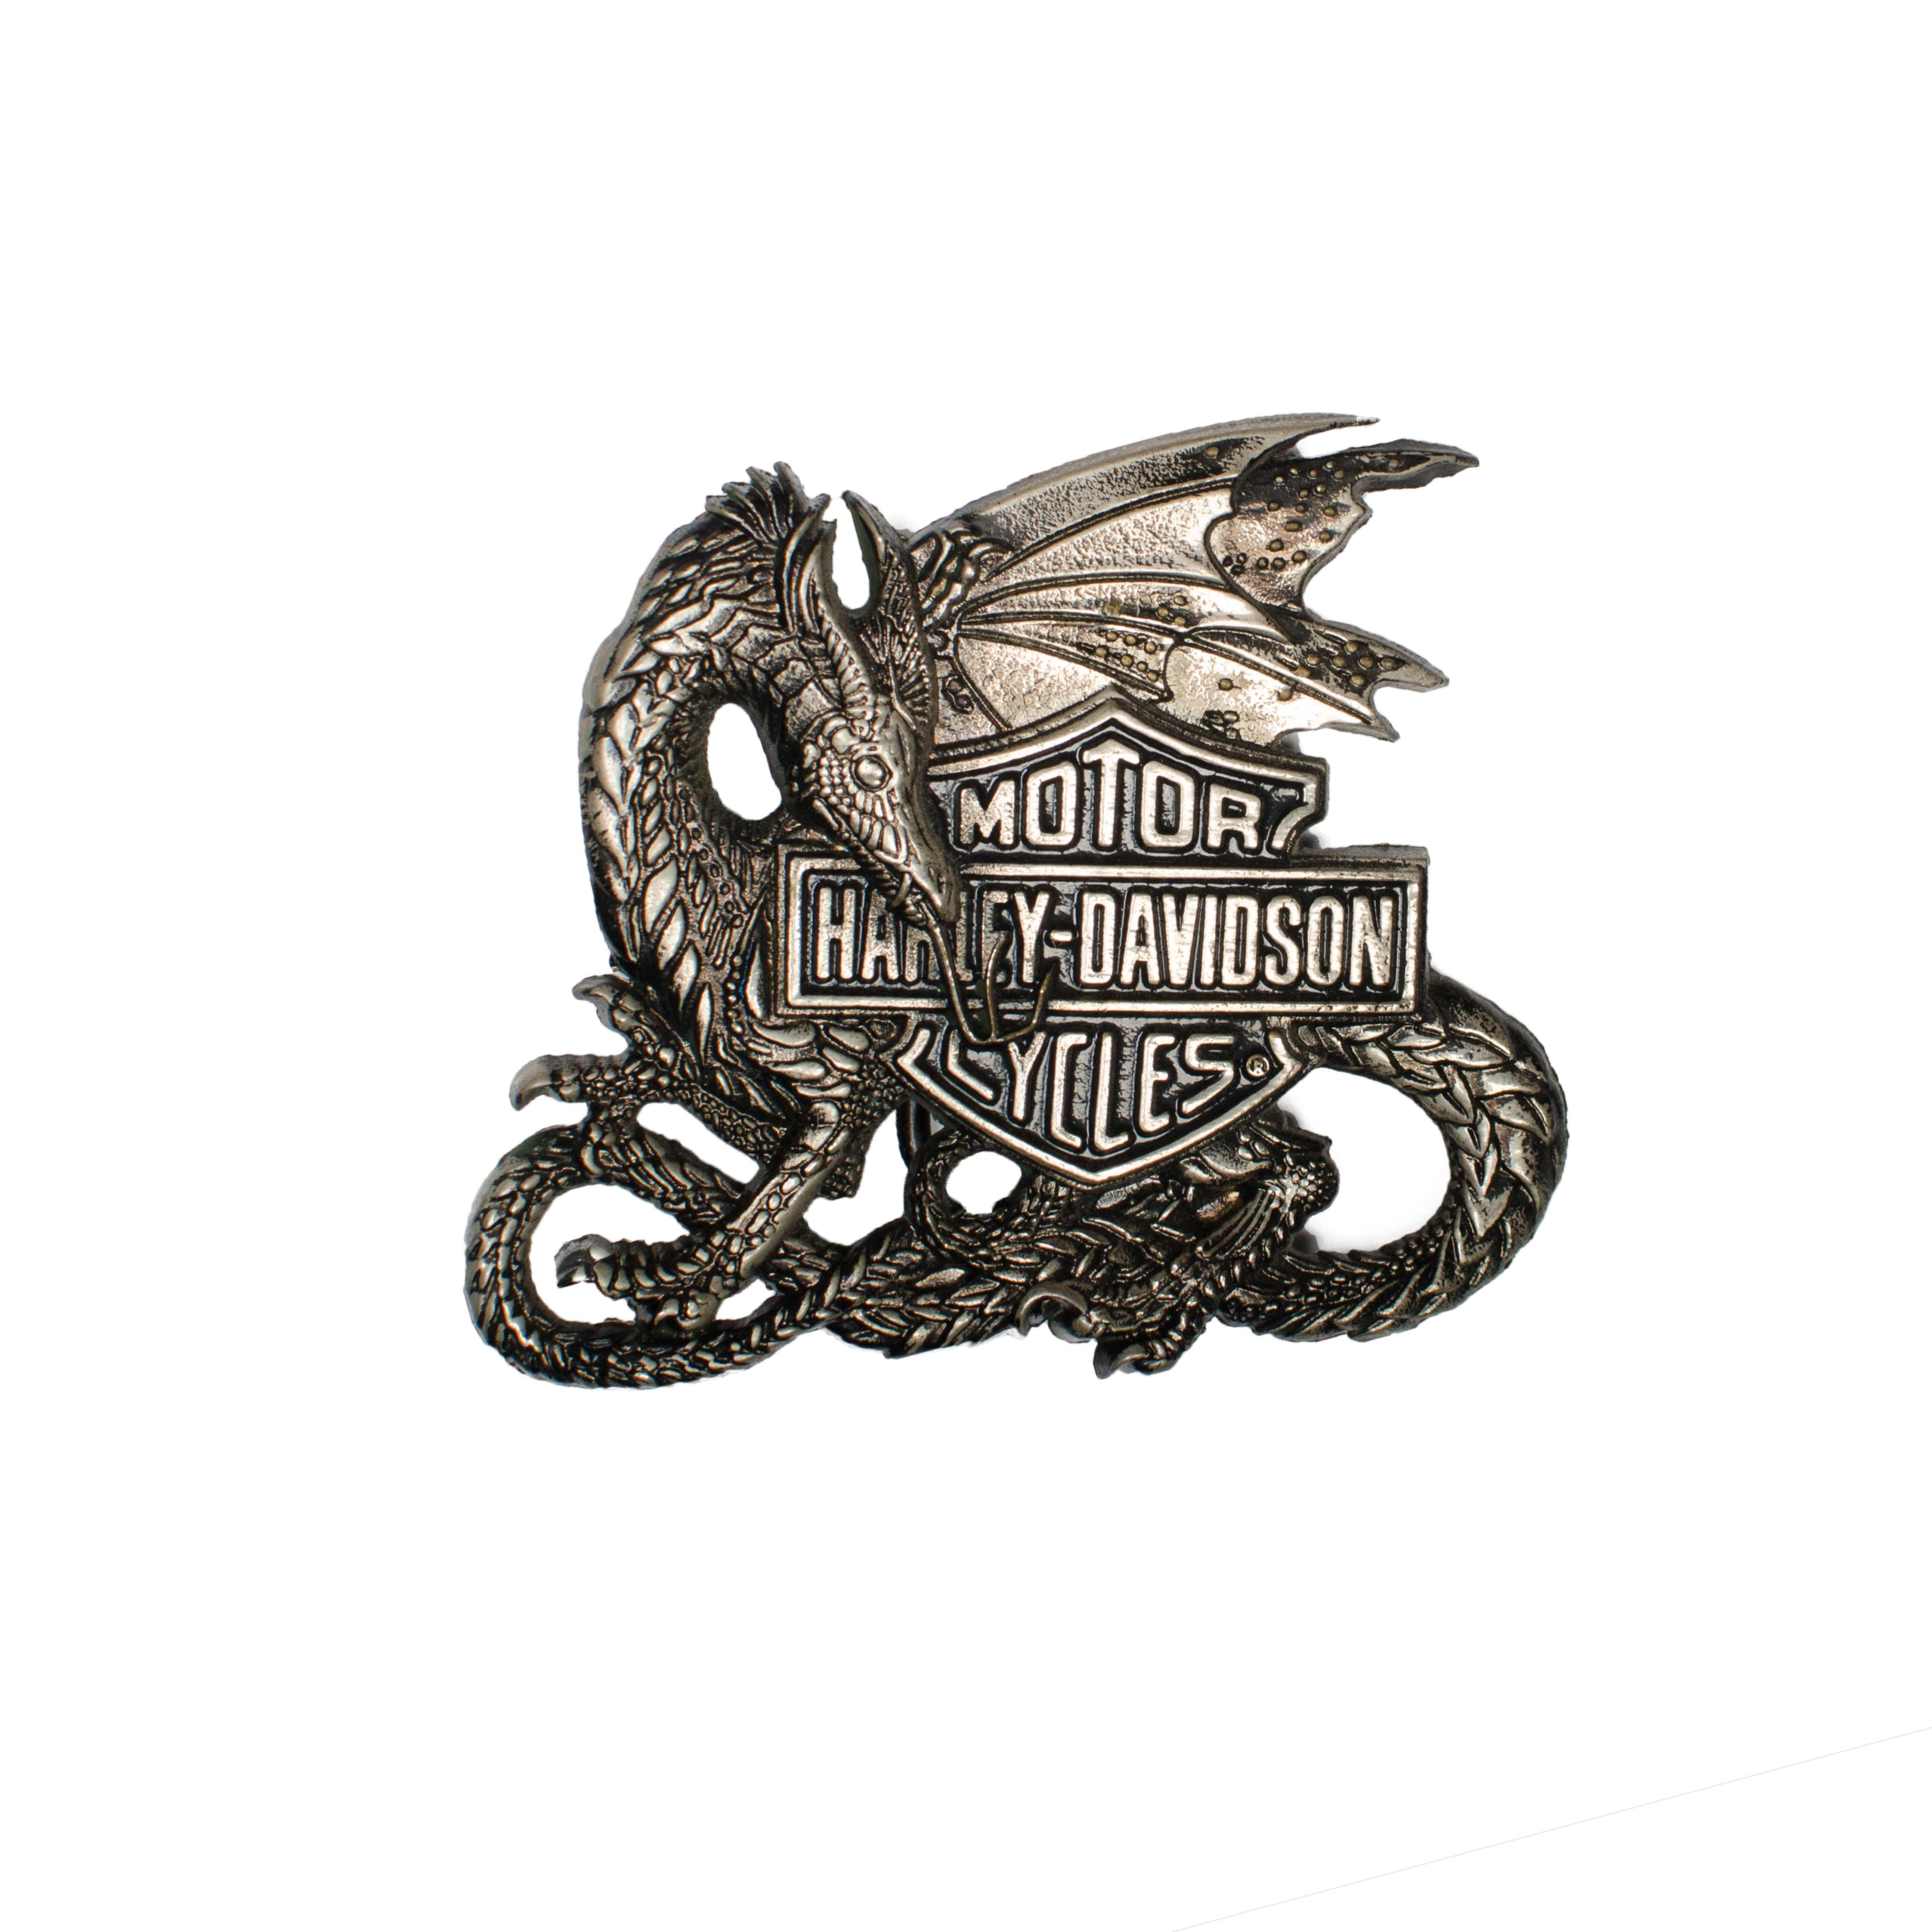 Harley Davidson Dragon Buckle H520 BARON 1983 Solid Brass